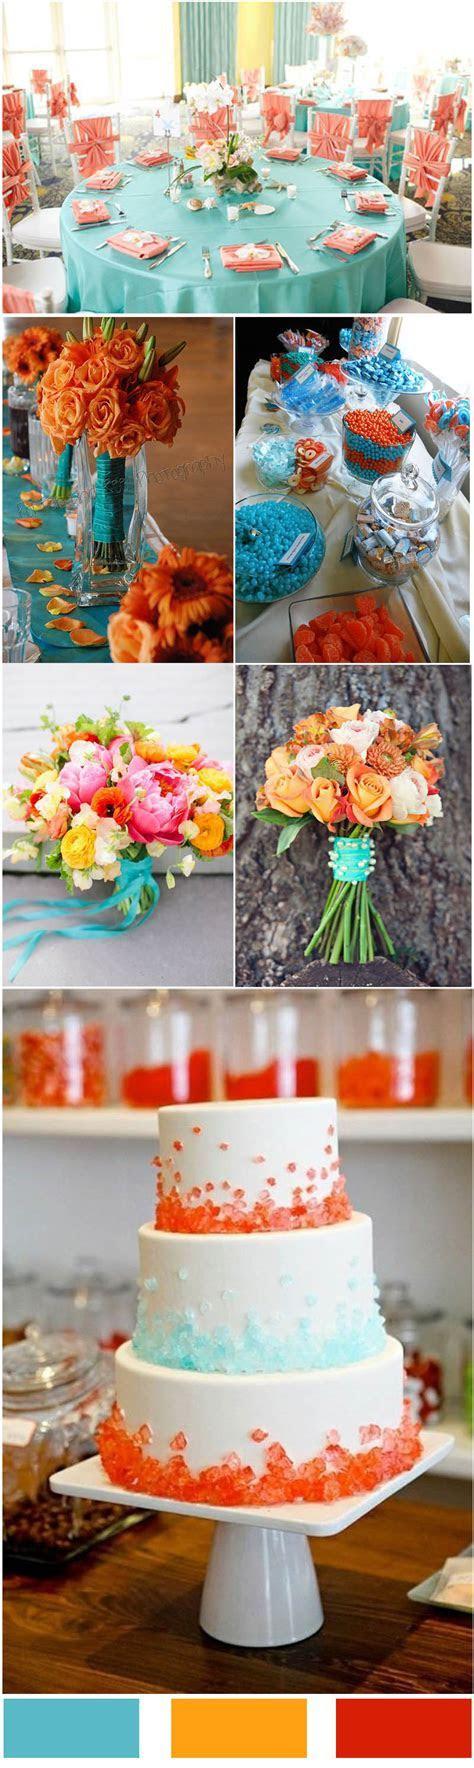 Tiffany Blue inspired Wedding Color Ideas